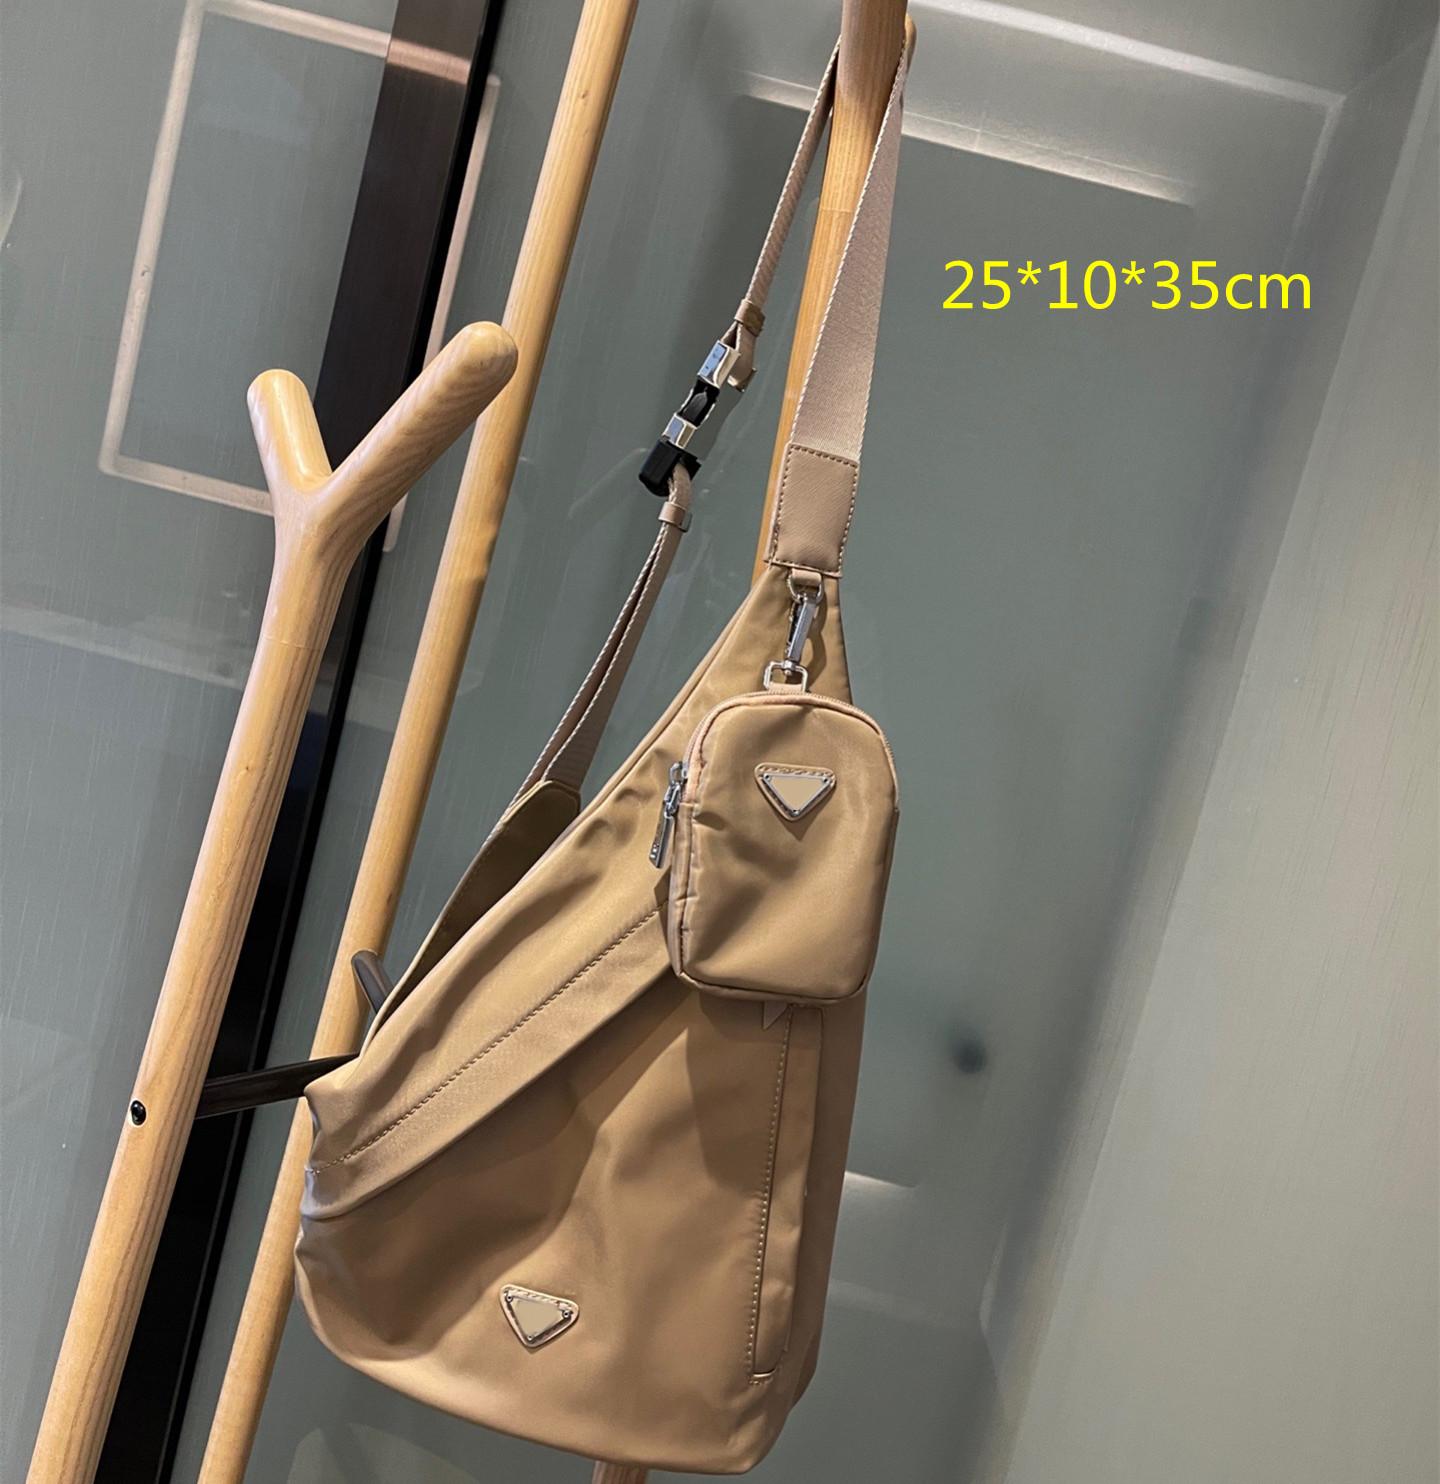 2021 2-pic Men Women Chest Bags Designer Shoulder Waist Bag Nylon Crossbody Medium Purses Cross Body Outdoor Packs high quality